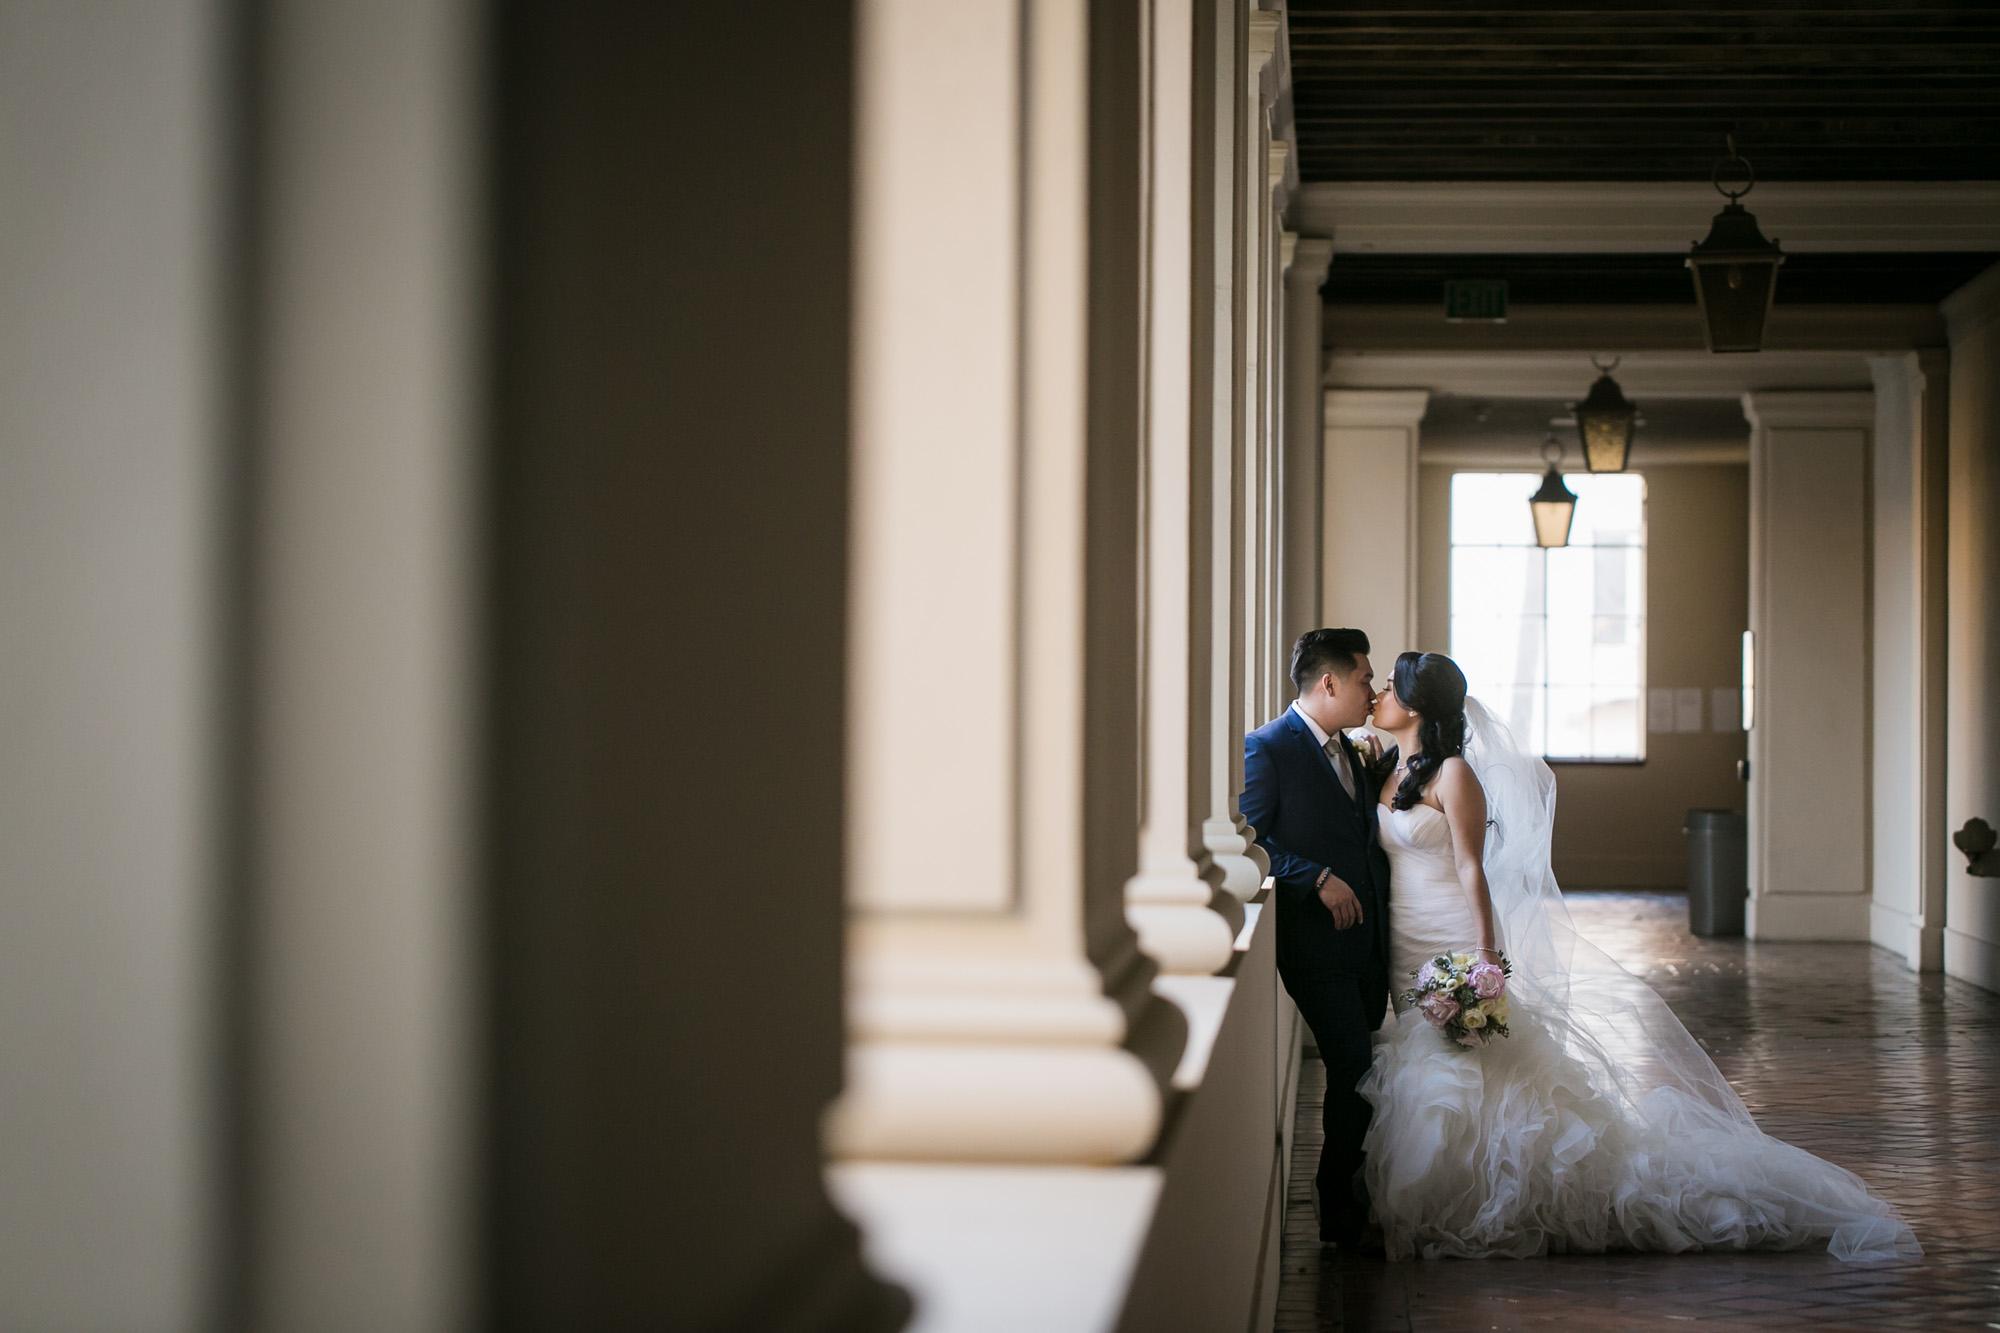 Geoff Kowalchuk JT Wedding Photo-016.jpg